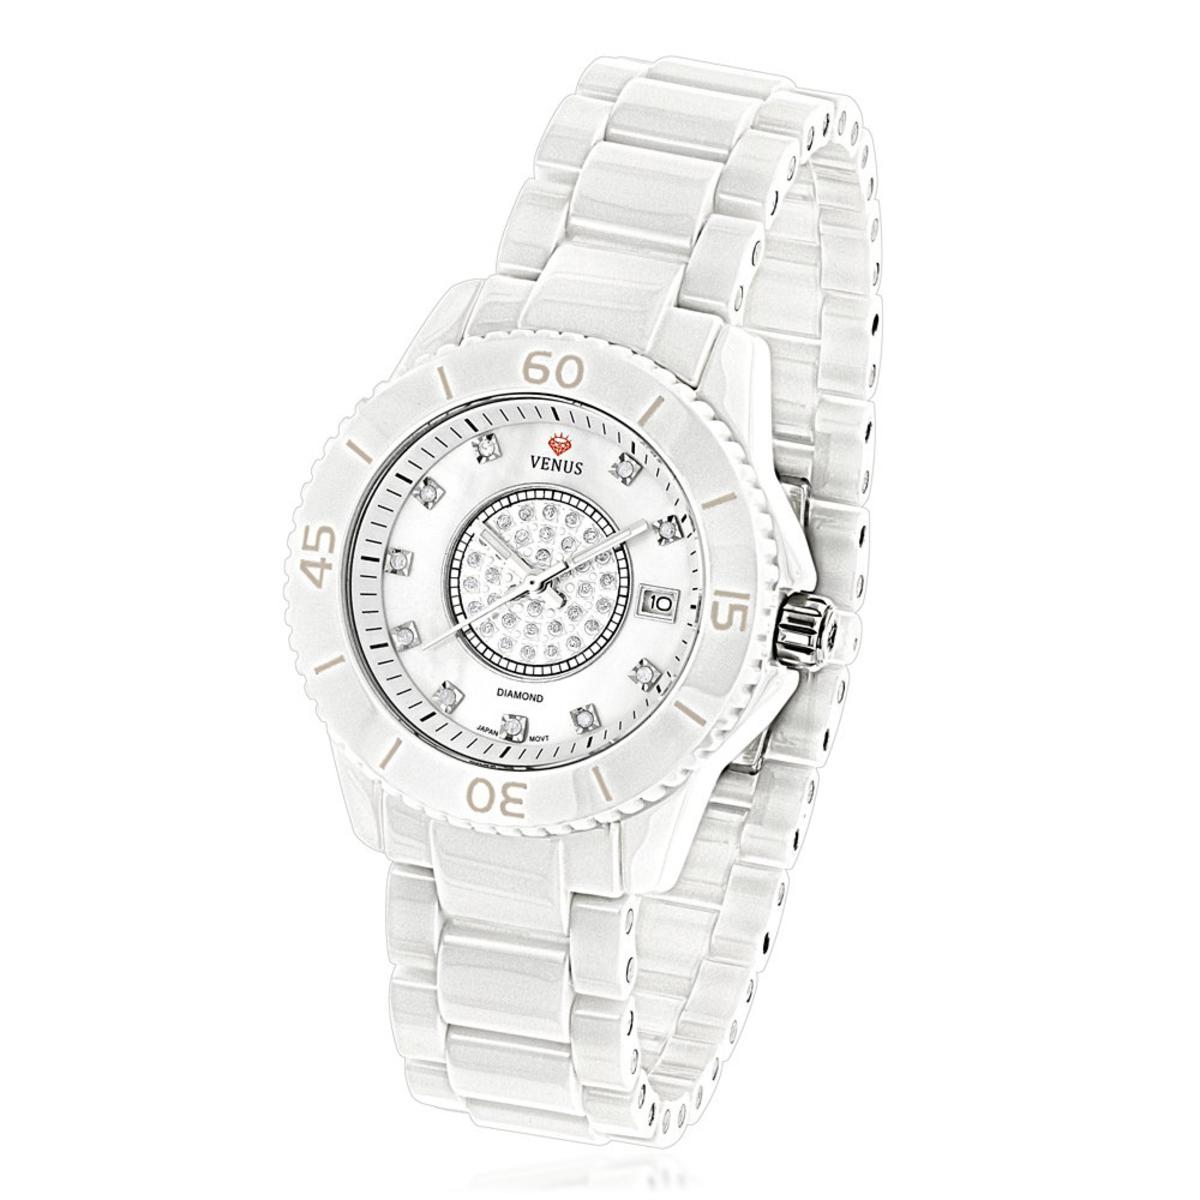 Icetime Stainless Steel & White Ceramic Case 0.15ct Ladies Diamonds Watch